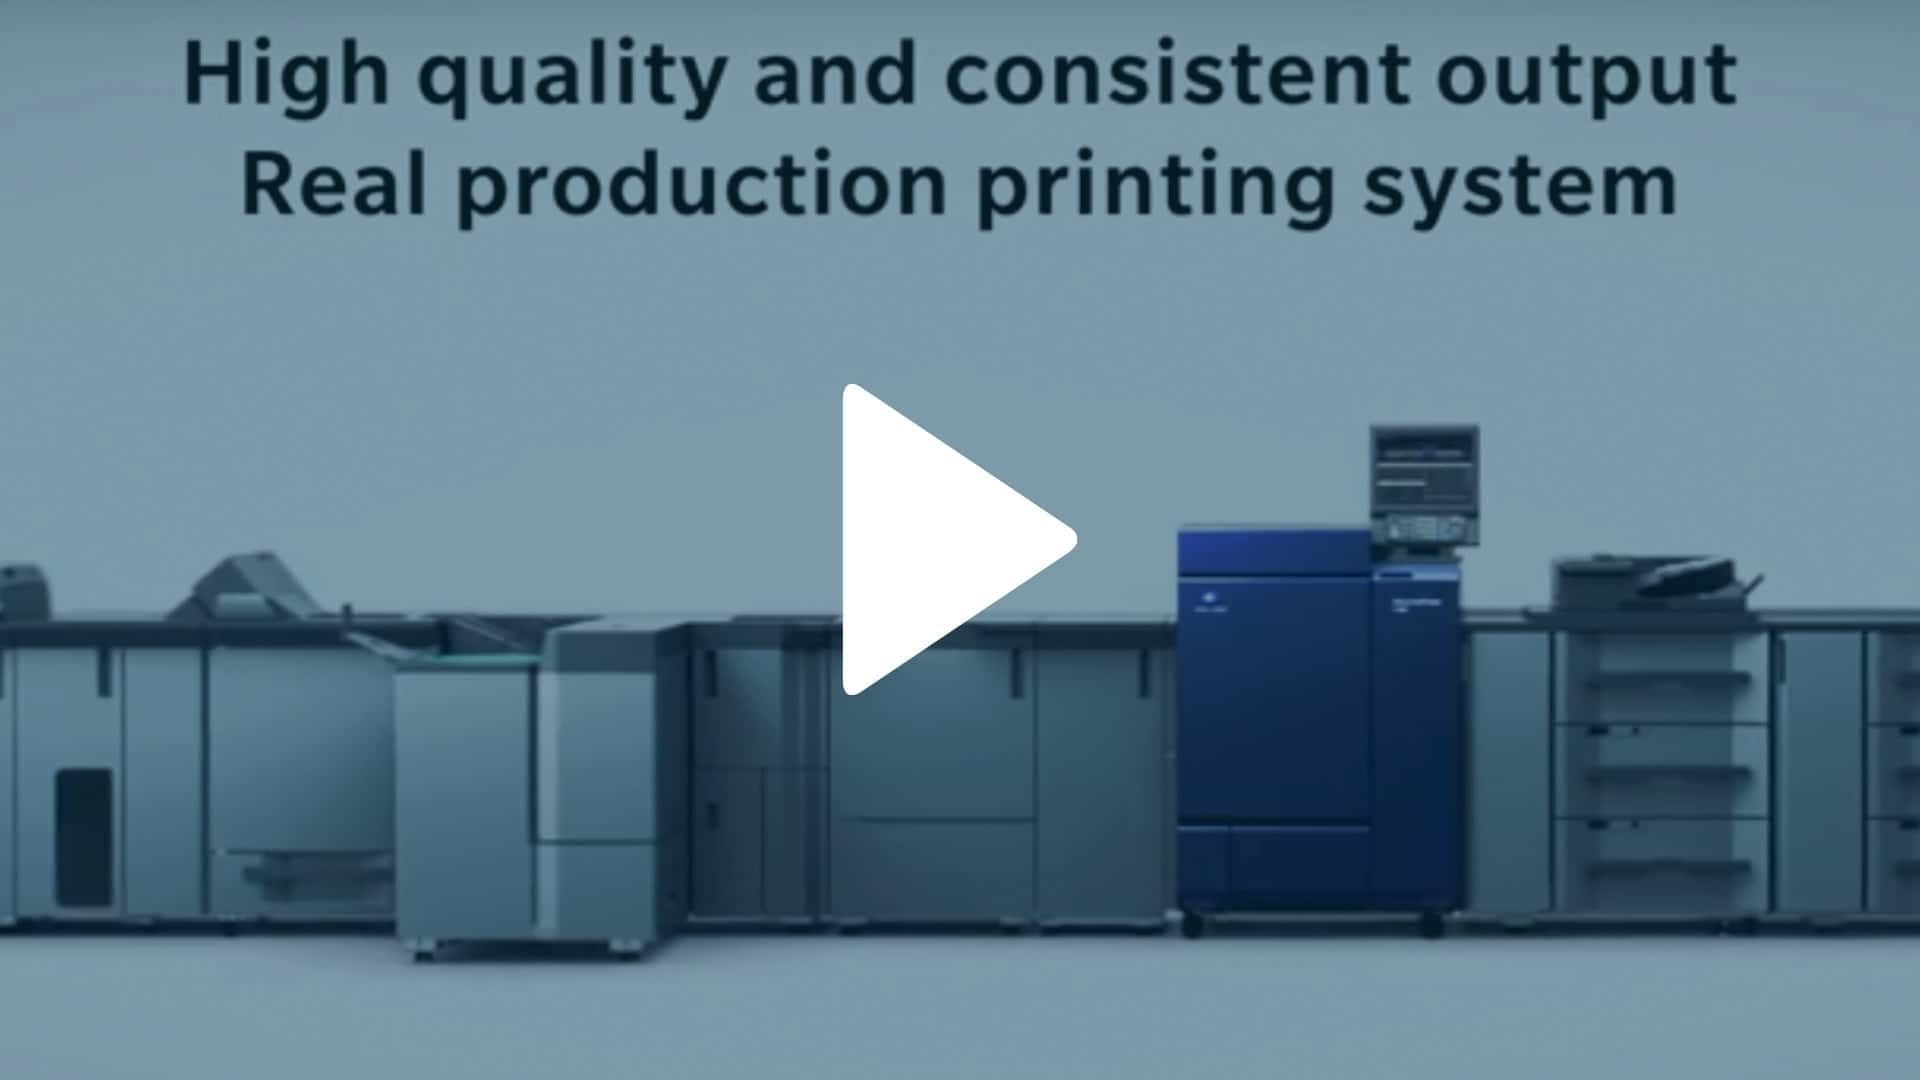 Konica Minolta AccurioPress C6100 Digital Color Press Video Overview Thumbnail